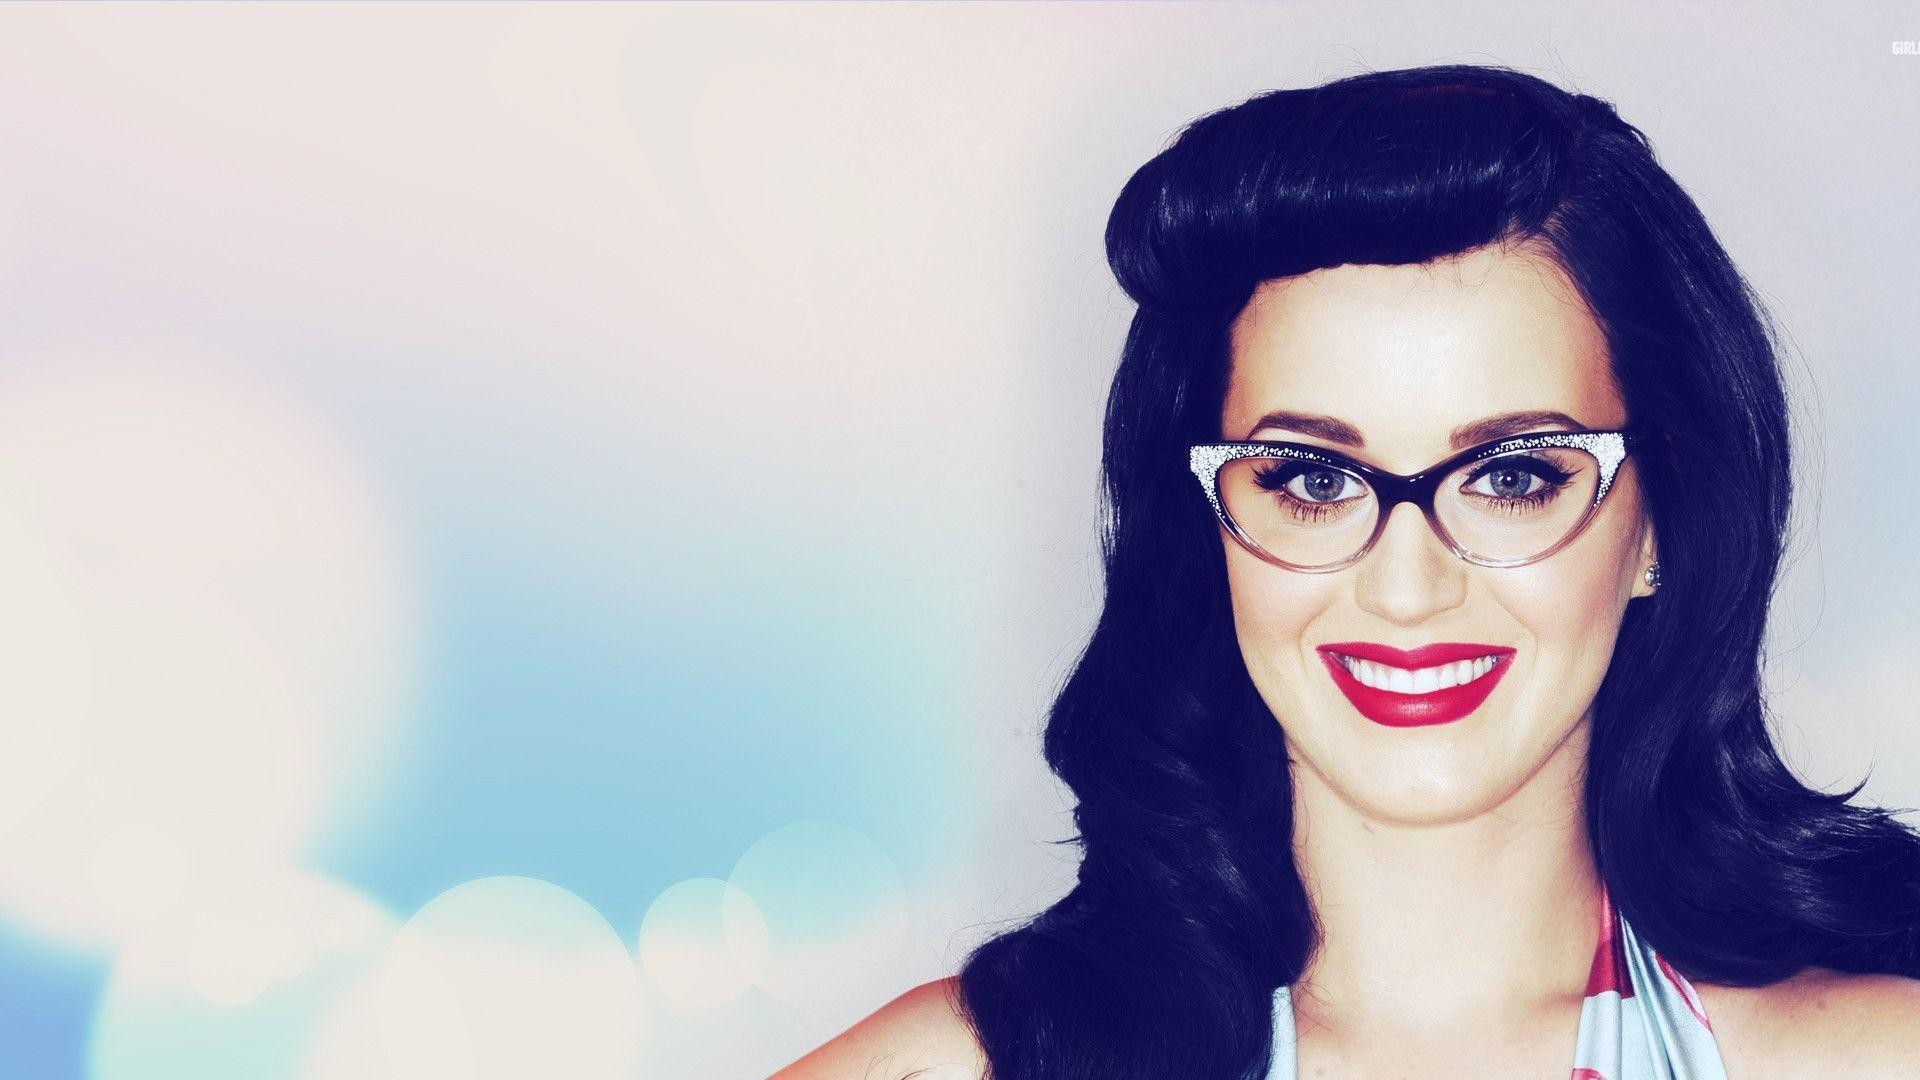 Katy Perry HD Wallpaper PC #8231 Wallpaper   Risewall.